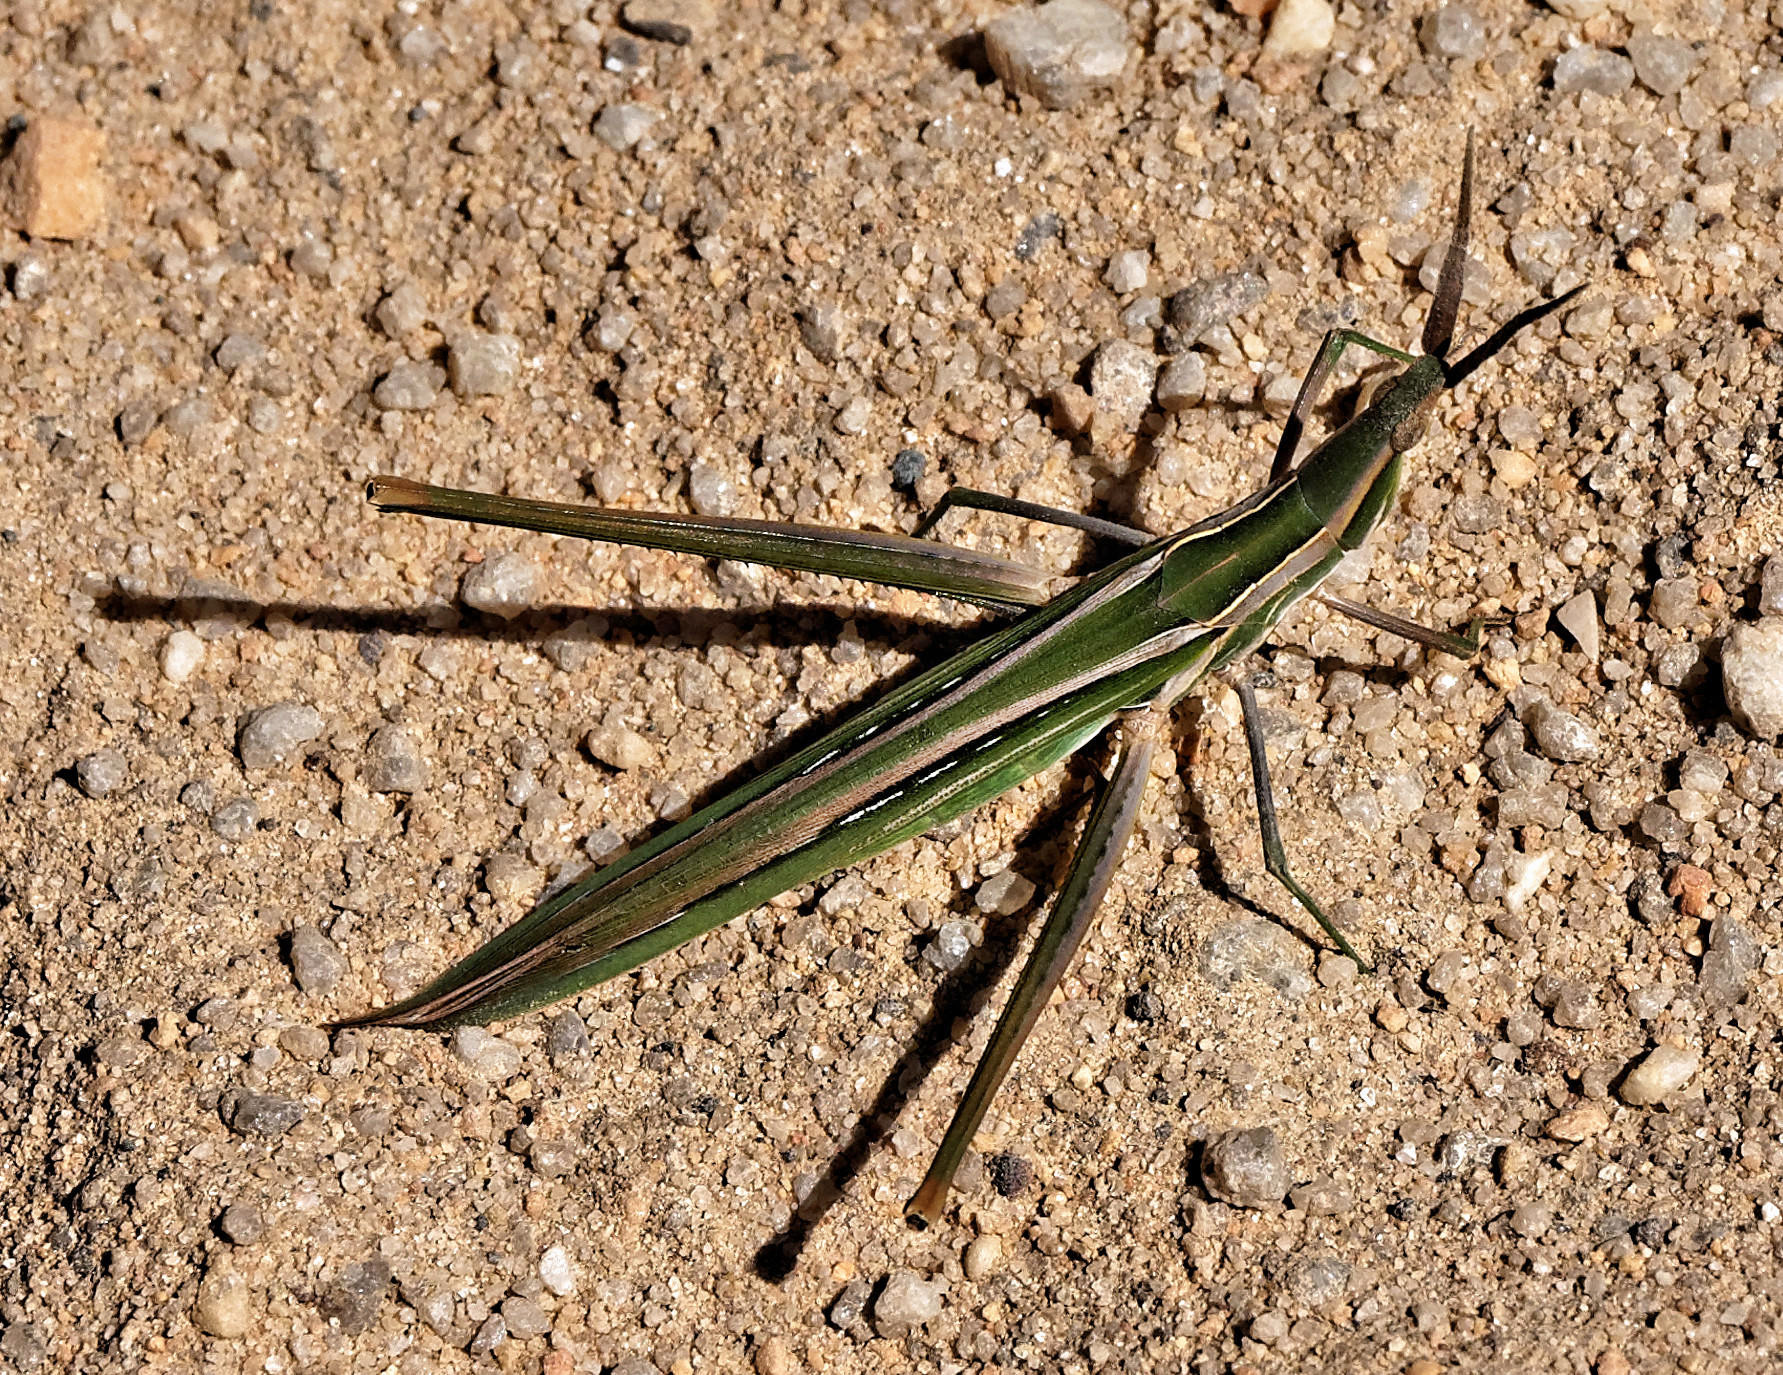 Mantis-1.jpeg